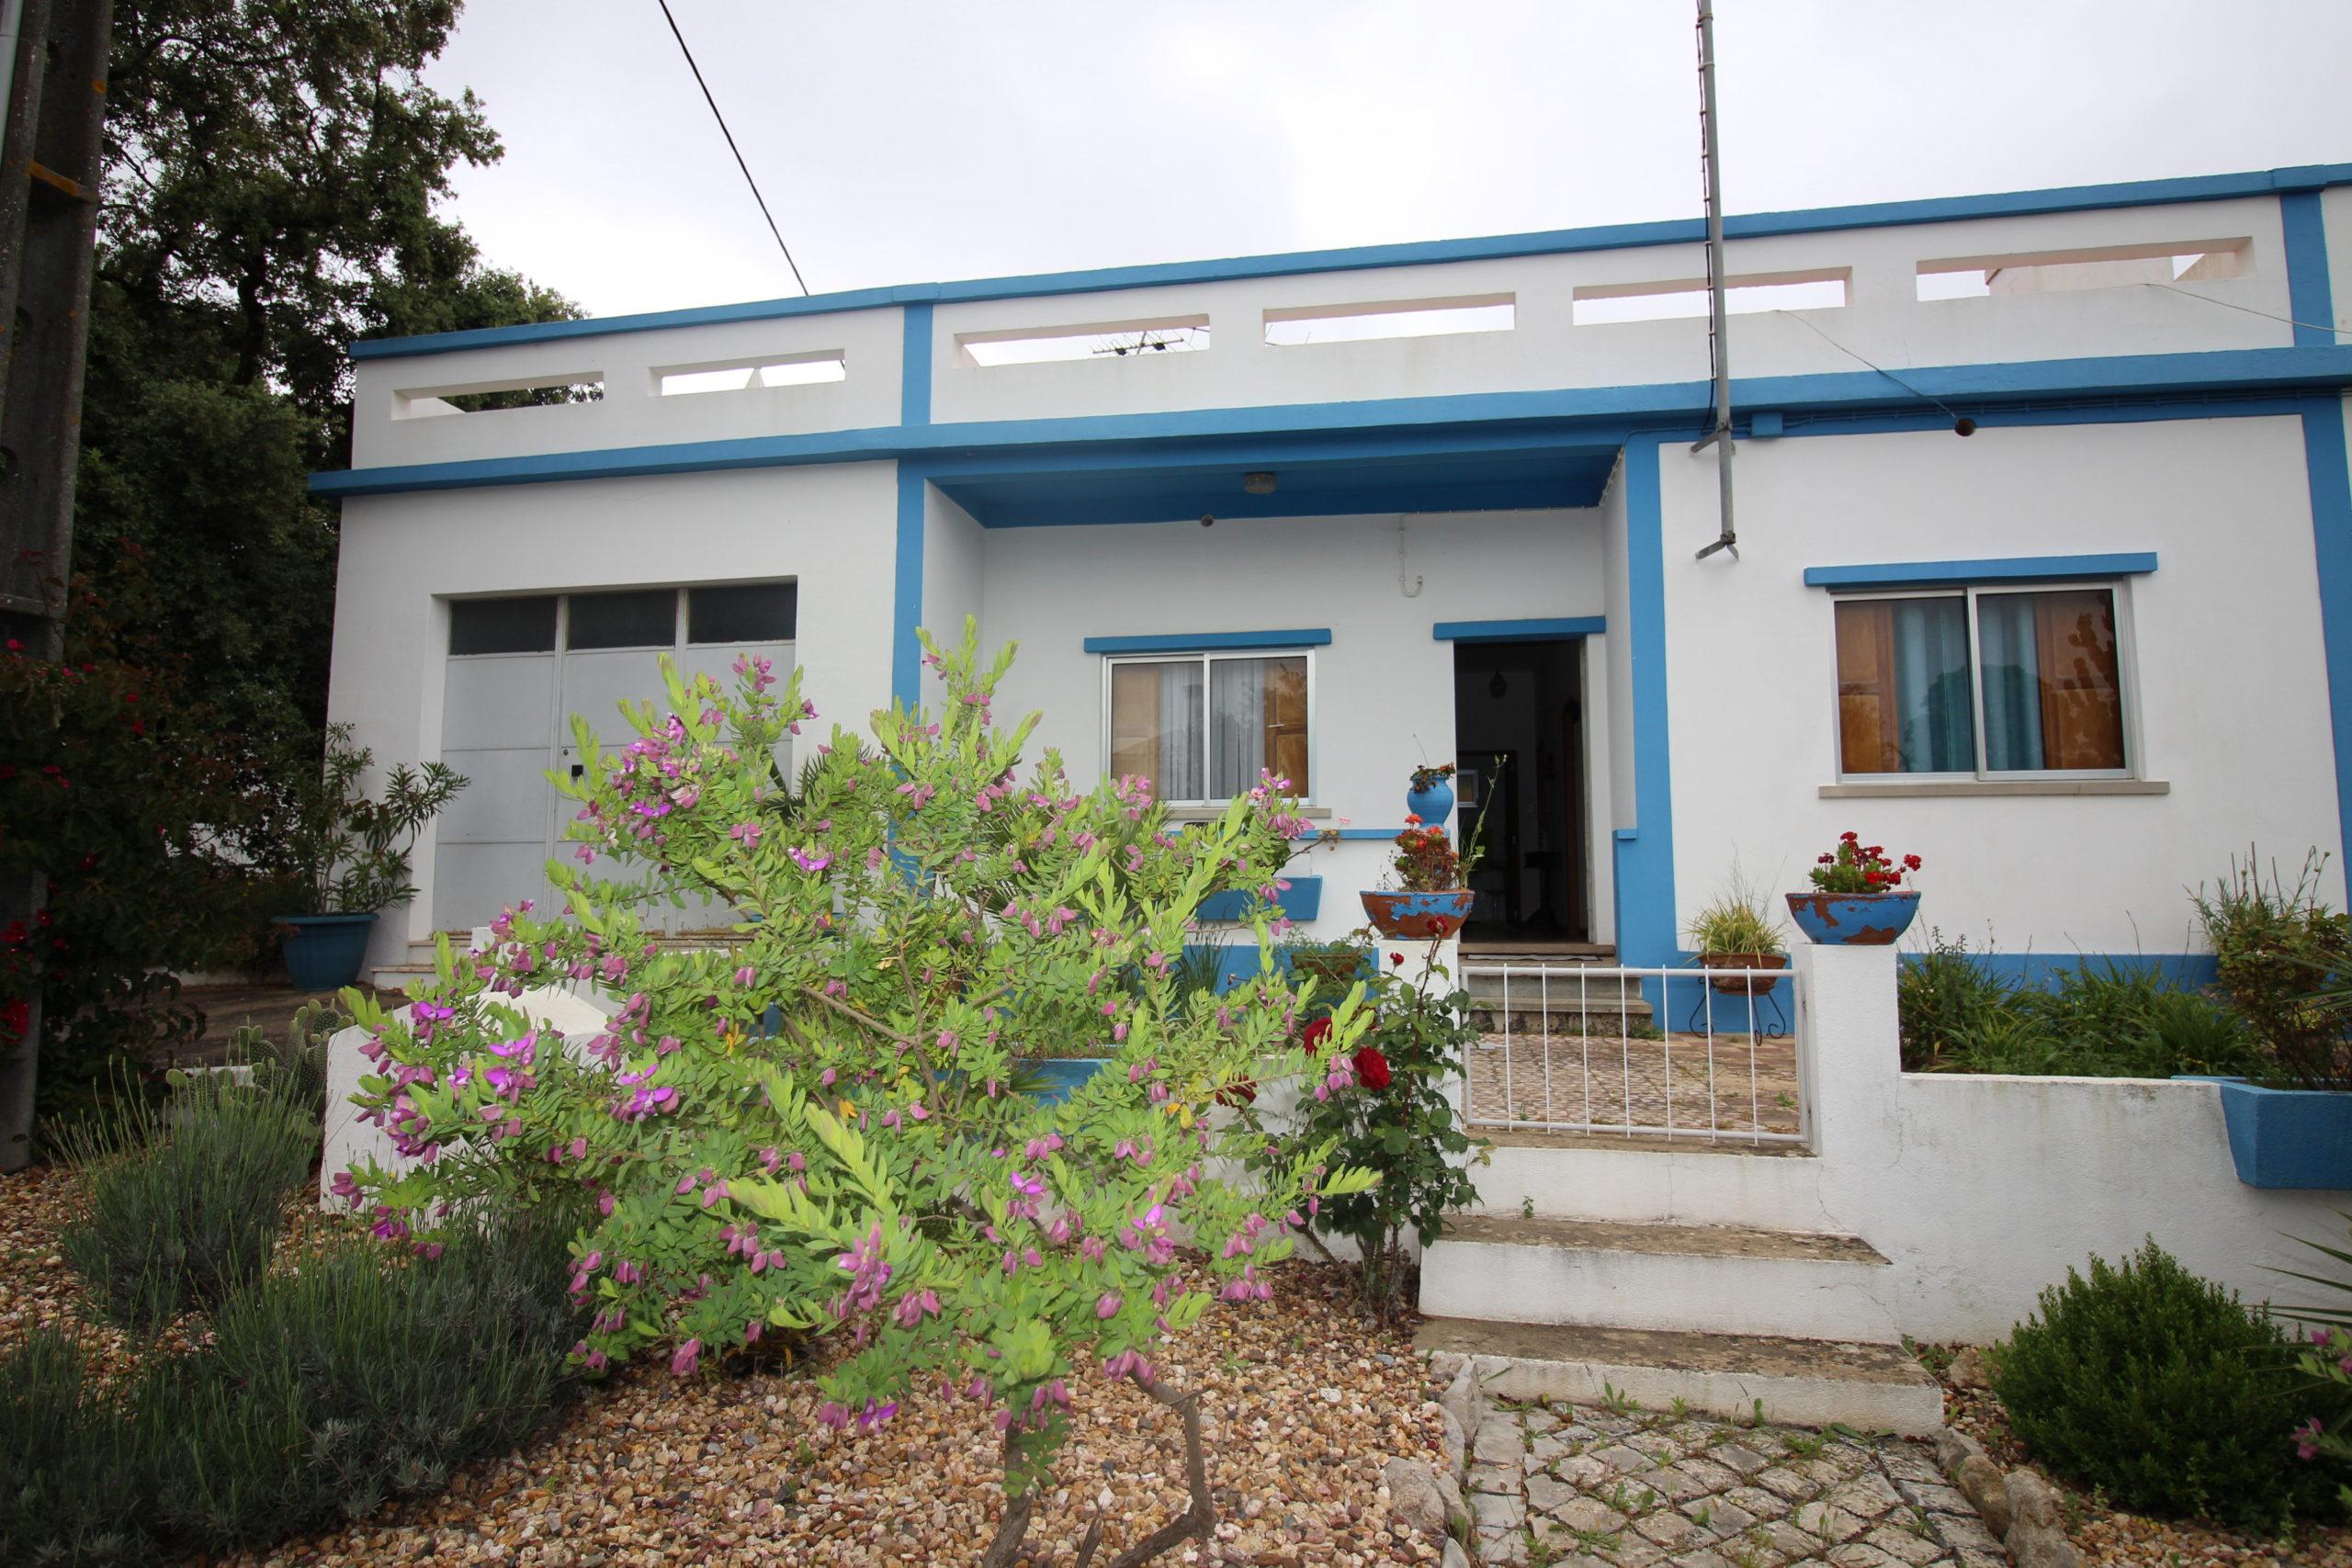 A 3-bedroom house  in the outskirts of São Brás de Alportel, Central Algarve